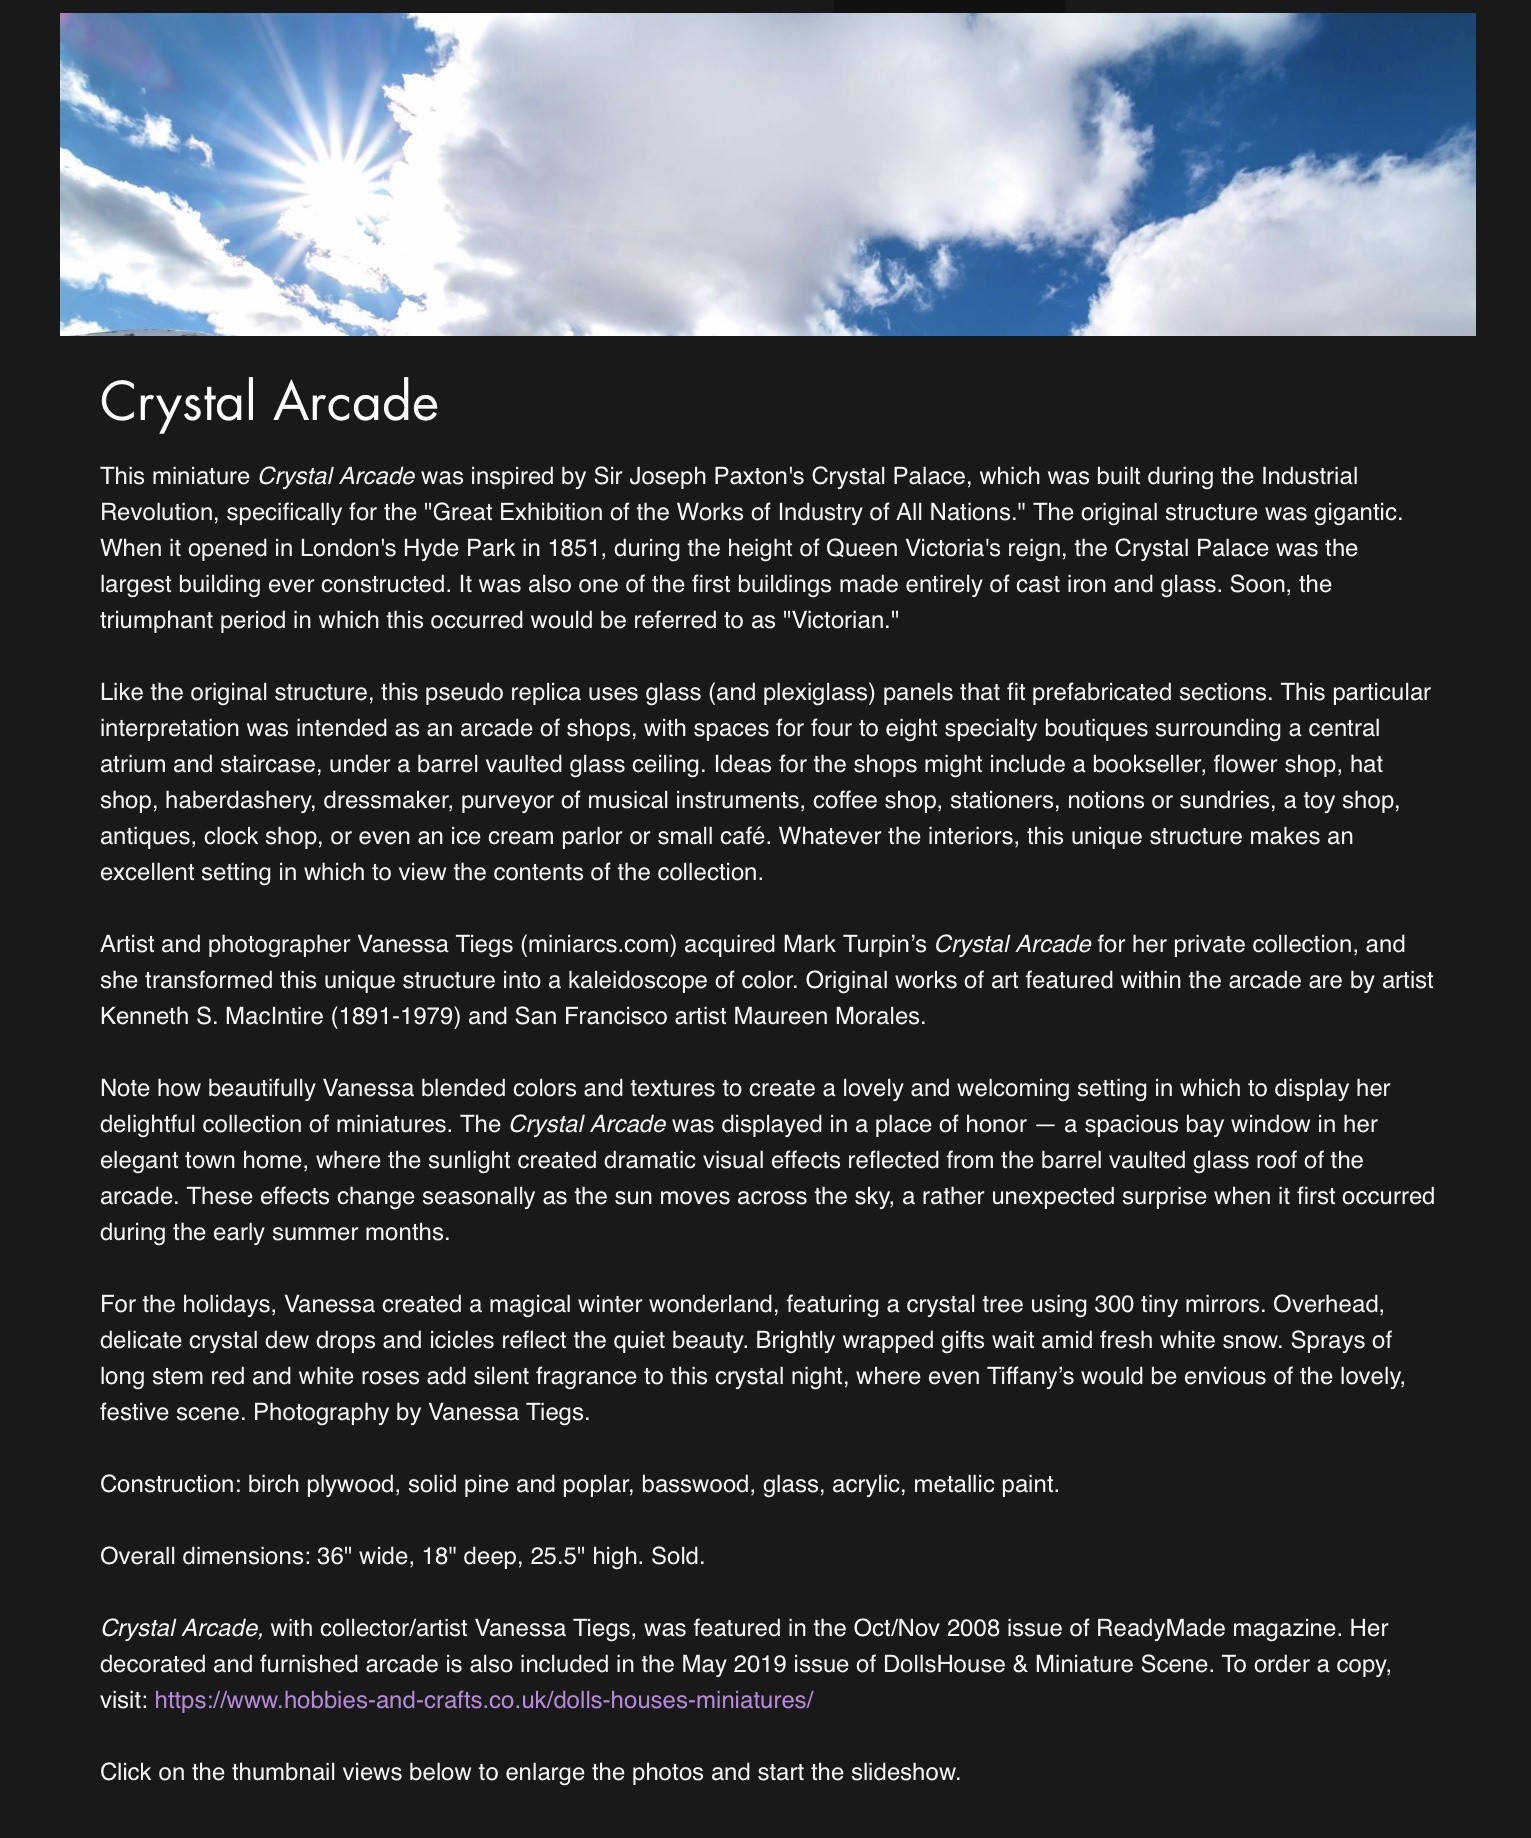 Crystal Arcade — 2005